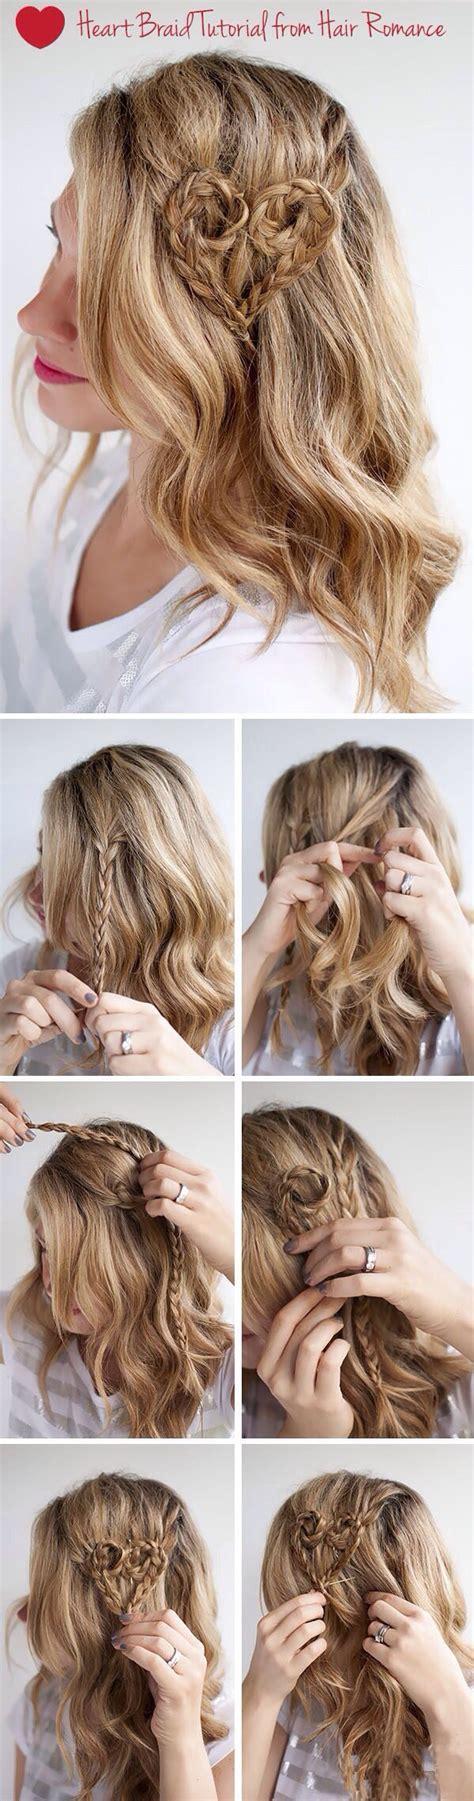 n easy hairstyles easy hairstyle hairstyles i easy hairstyles easy hairstyles and